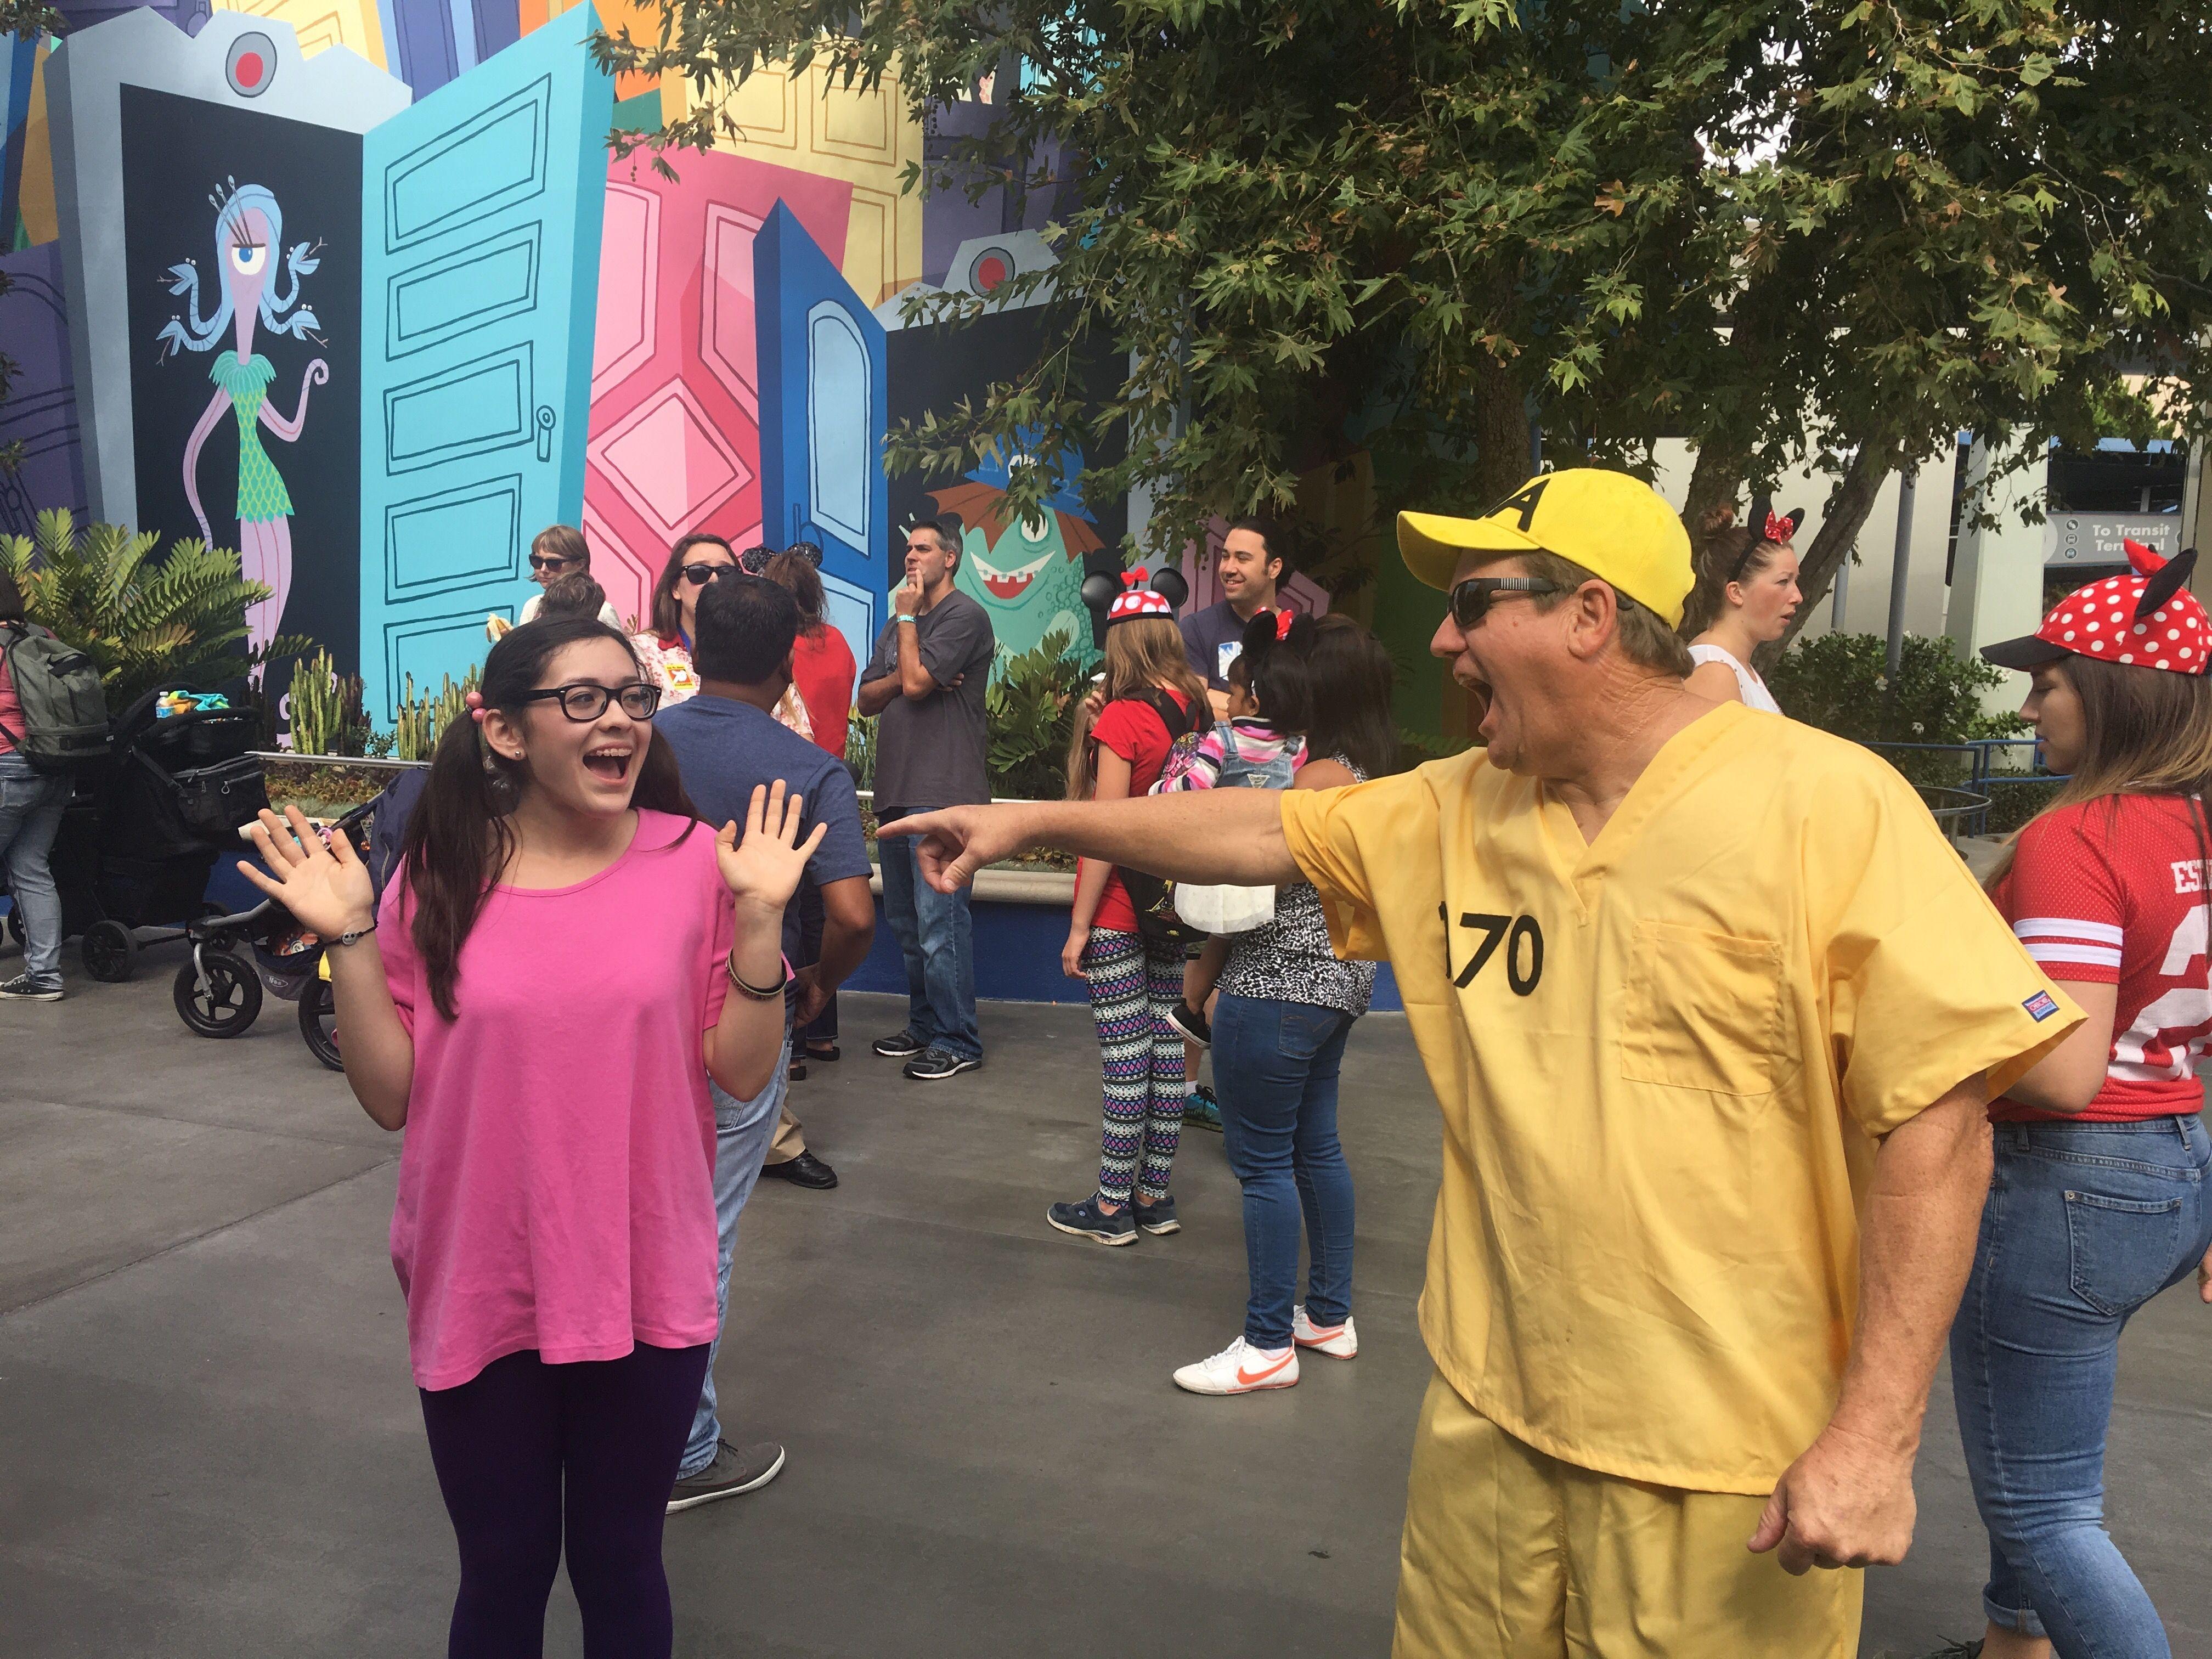 CDA costume with Boo  Monsters Inc DIY costumes  Disney